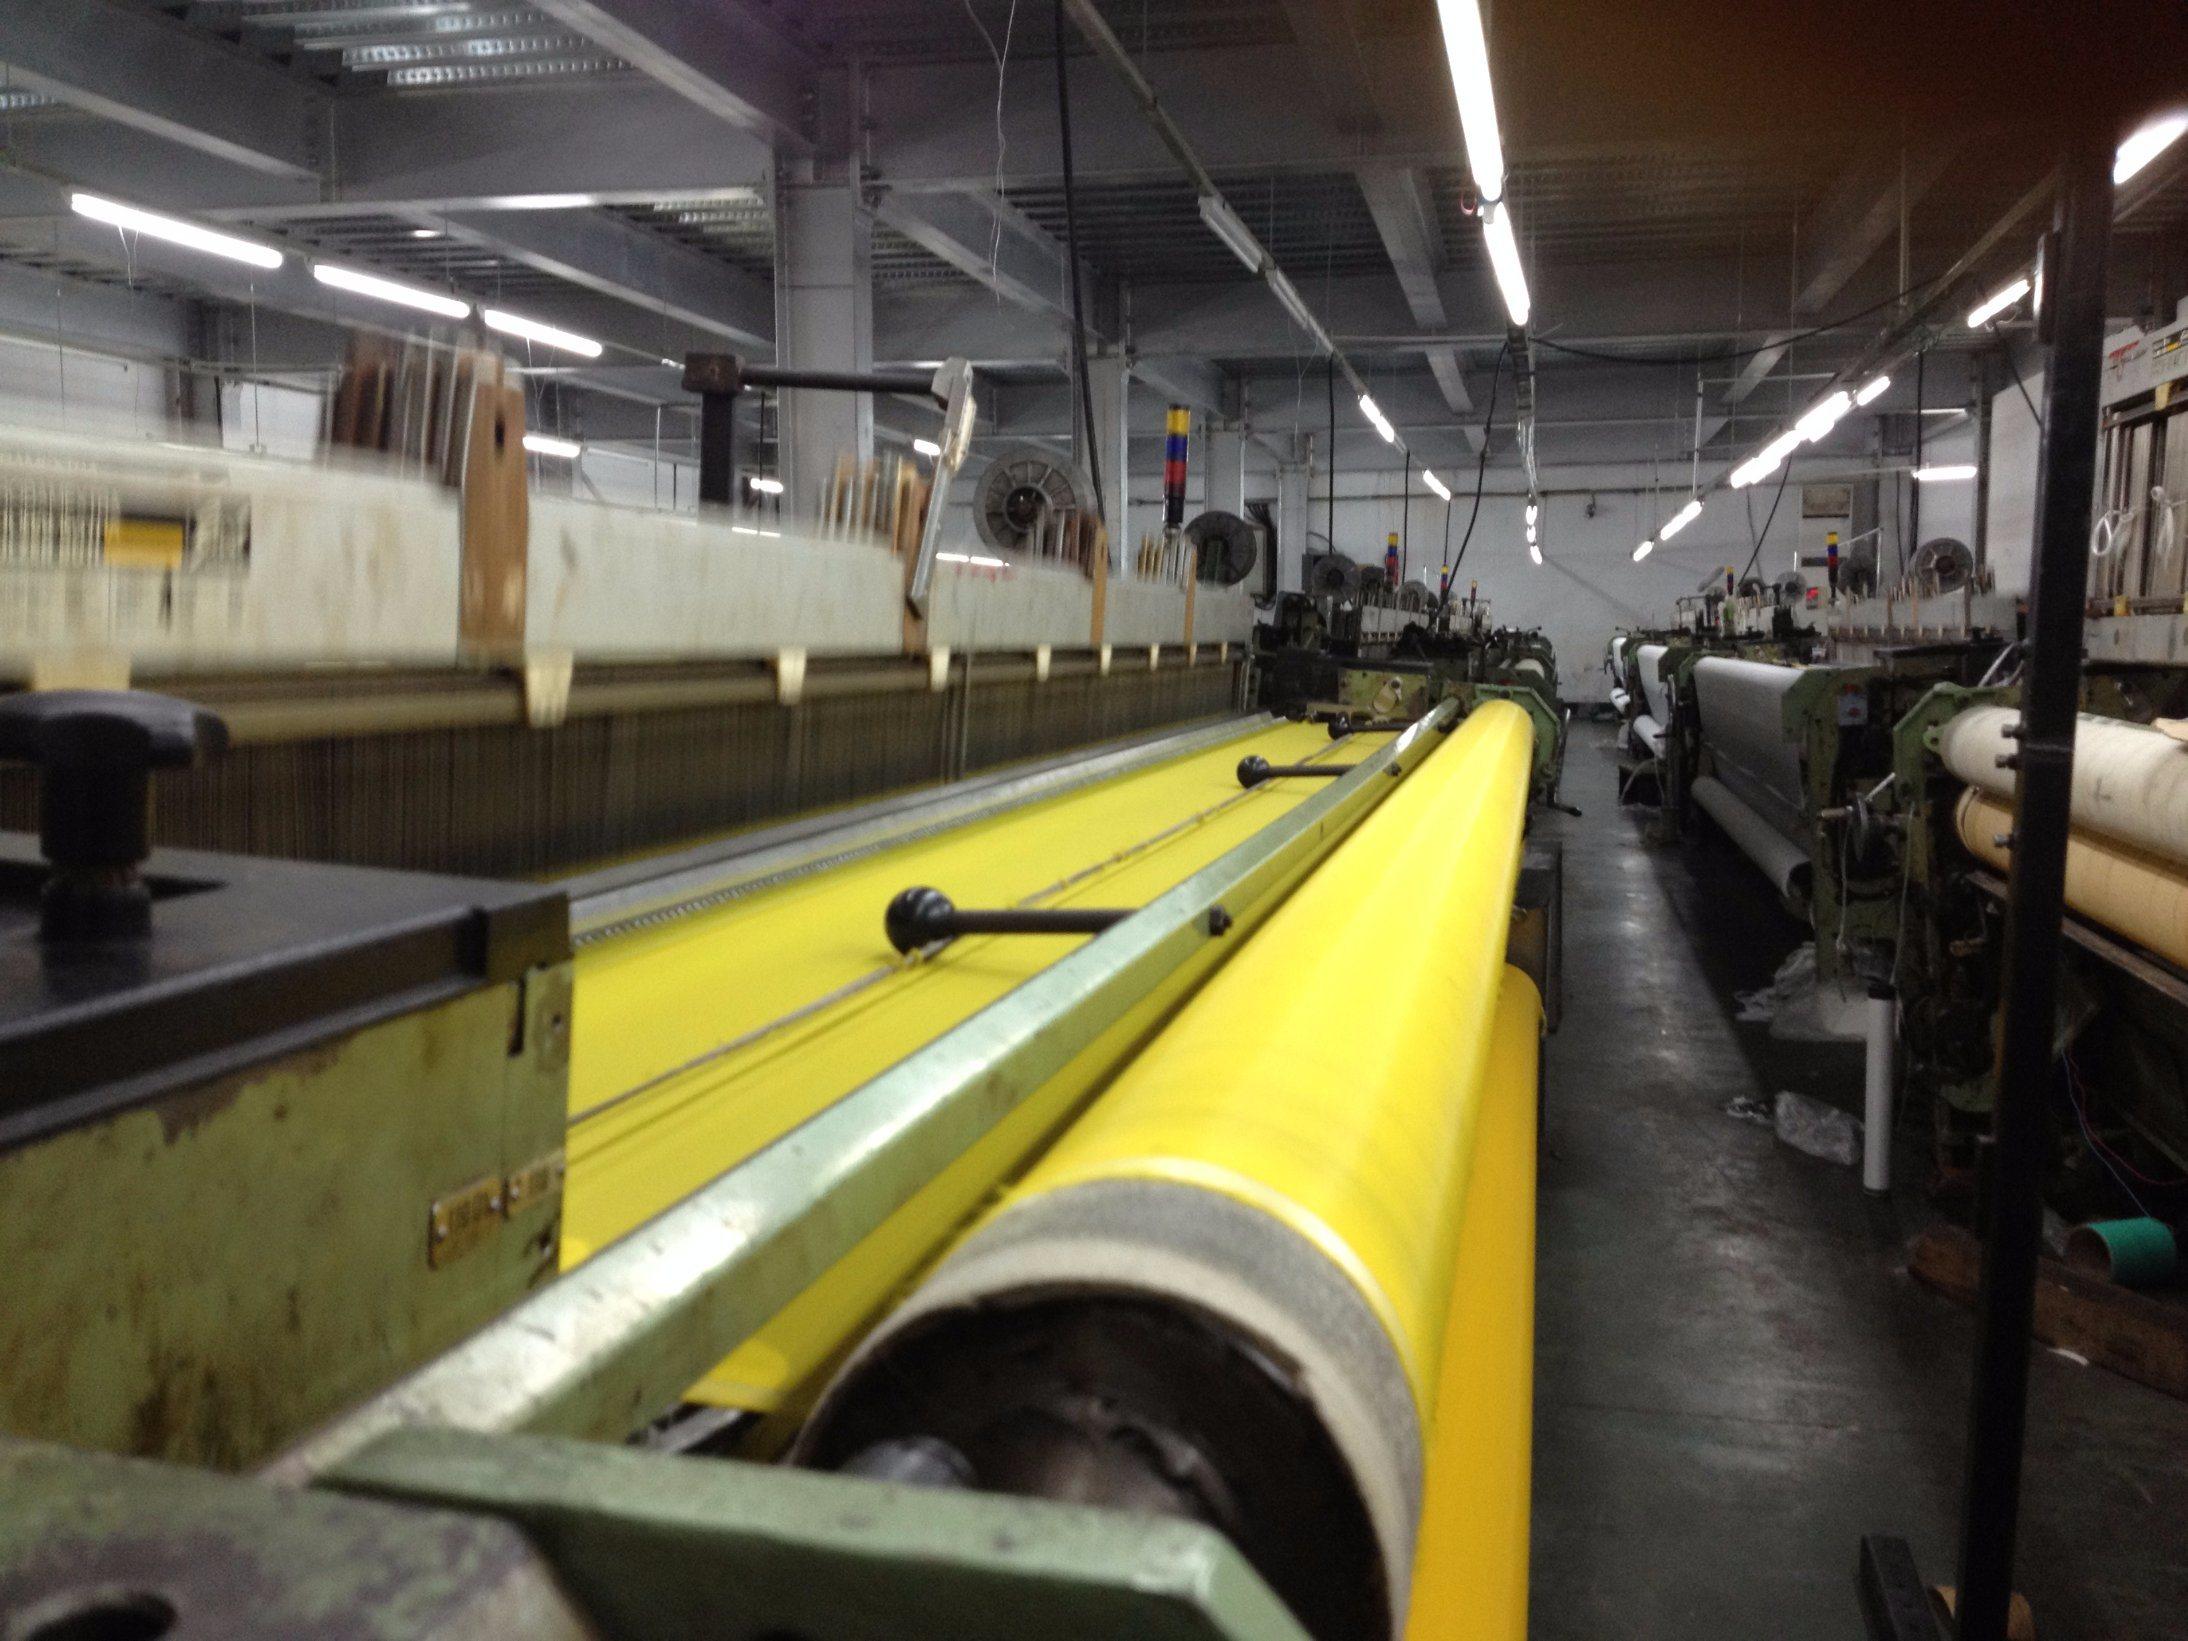 Dpp140t-34W White Monofilament Polyester Printing Mesh